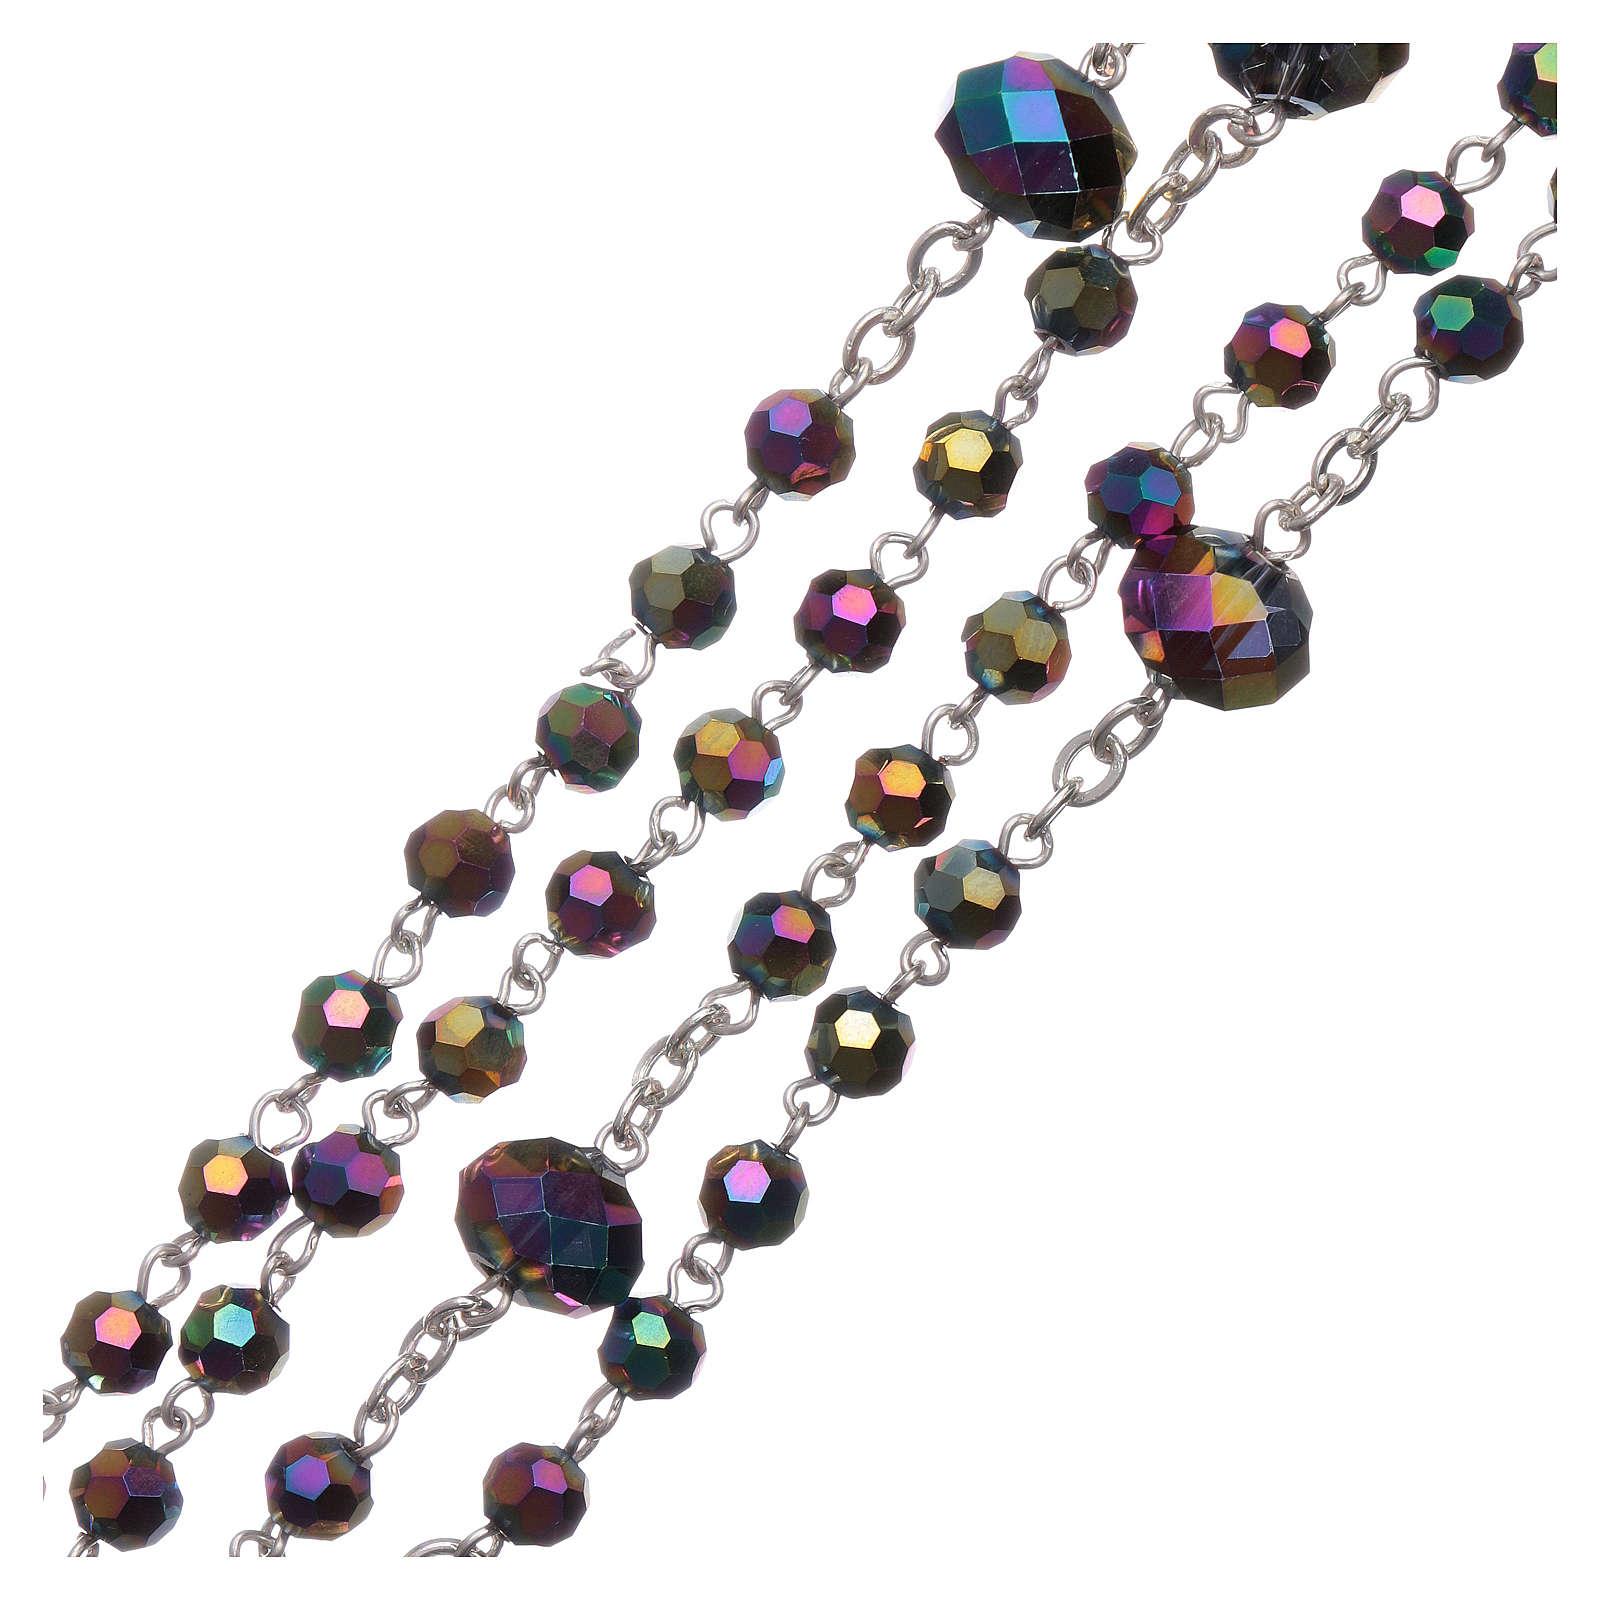 Chapelet collier Medjugorje cristal iridescent 4 mm 4